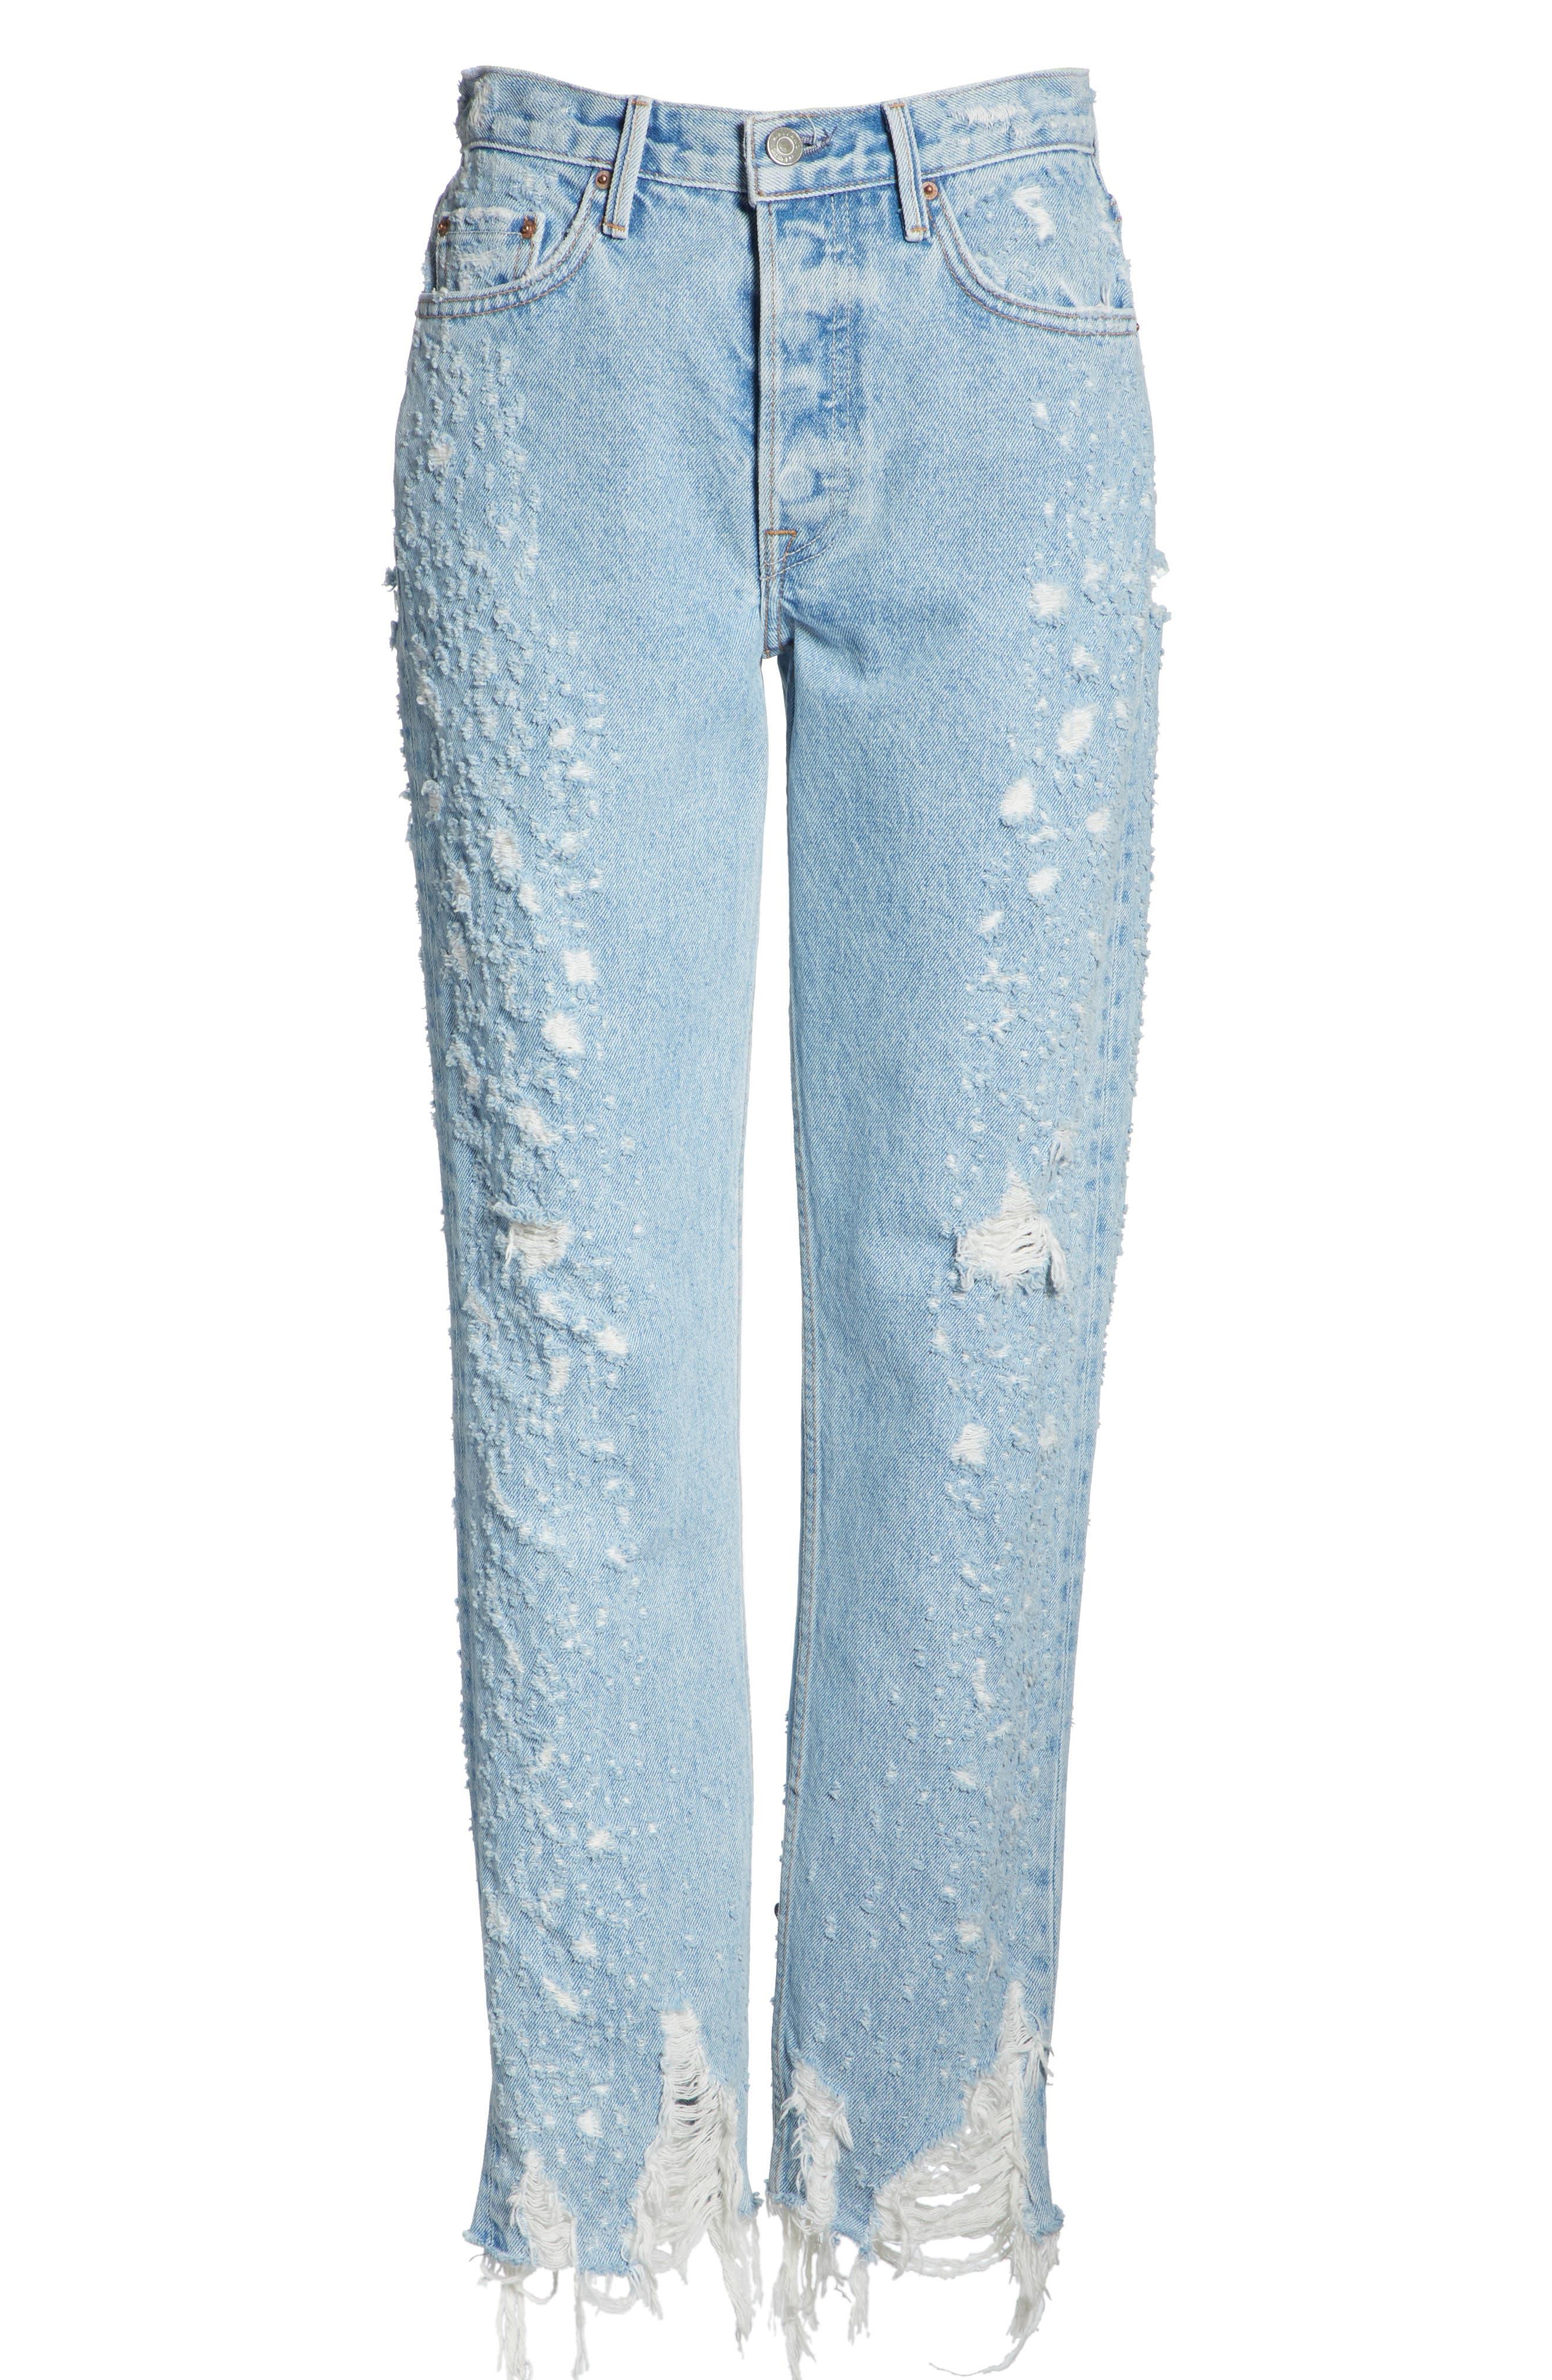 Helena Rigid High Waist Straight Jeans,                             Alternate thumbnail 7, color,                             BURN OUT